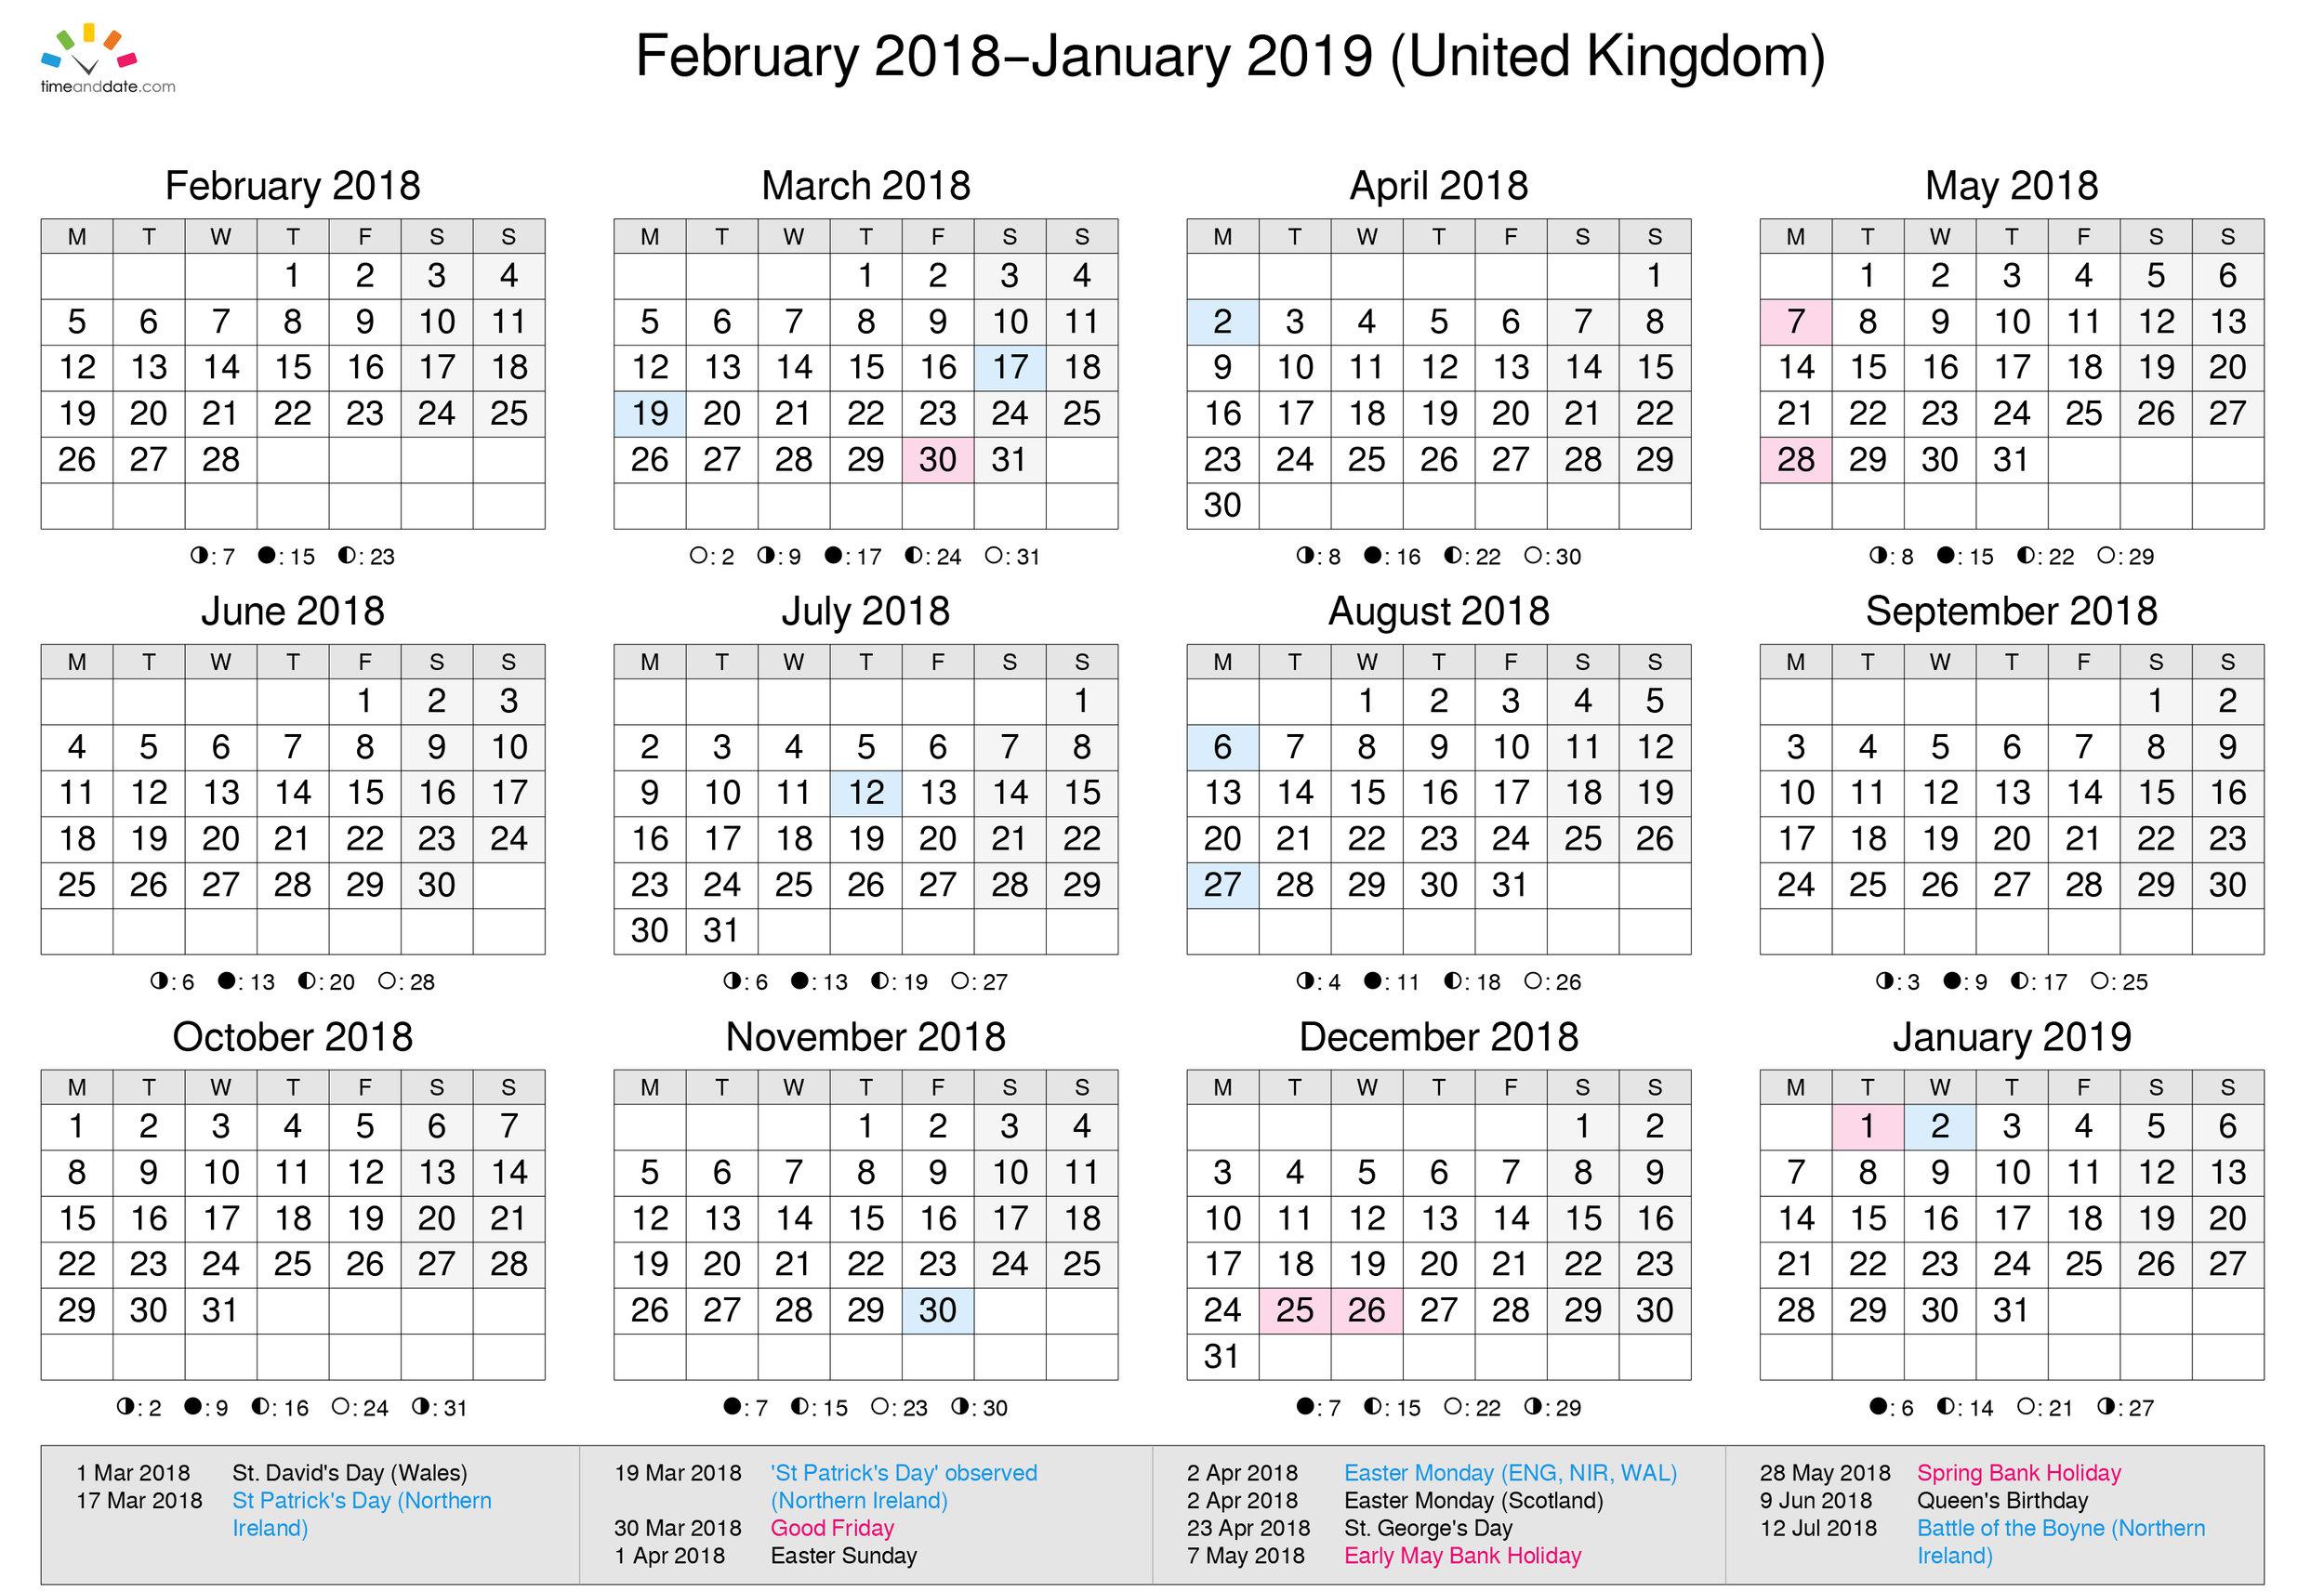 United Kingdom February 2018–January 2019